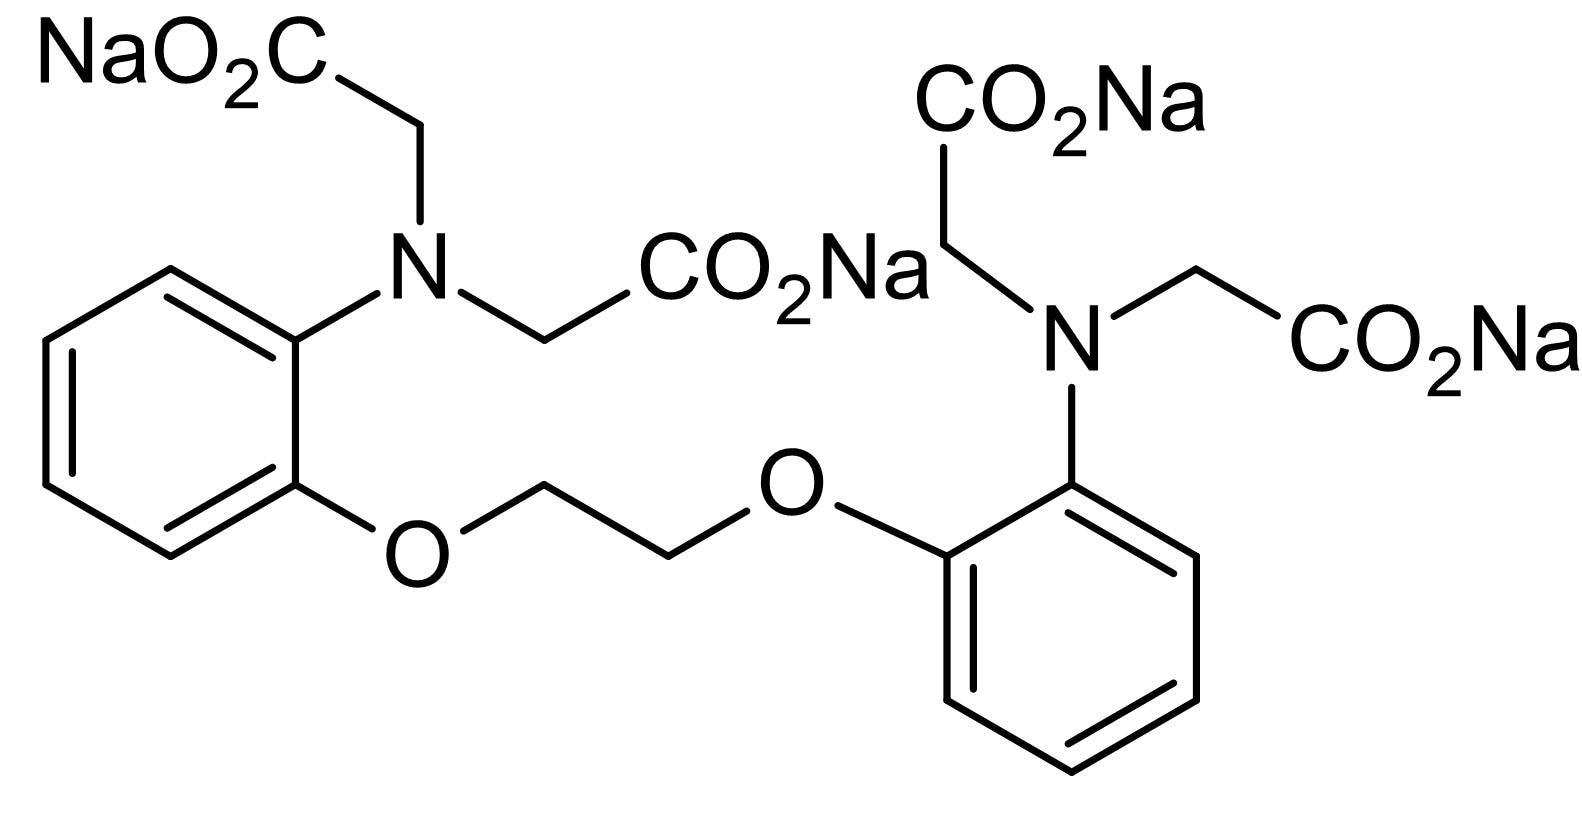 Chemical Structure - BAPTA tetrasodium salt, Ca<sup>2+</sup>chelator (ab147104)